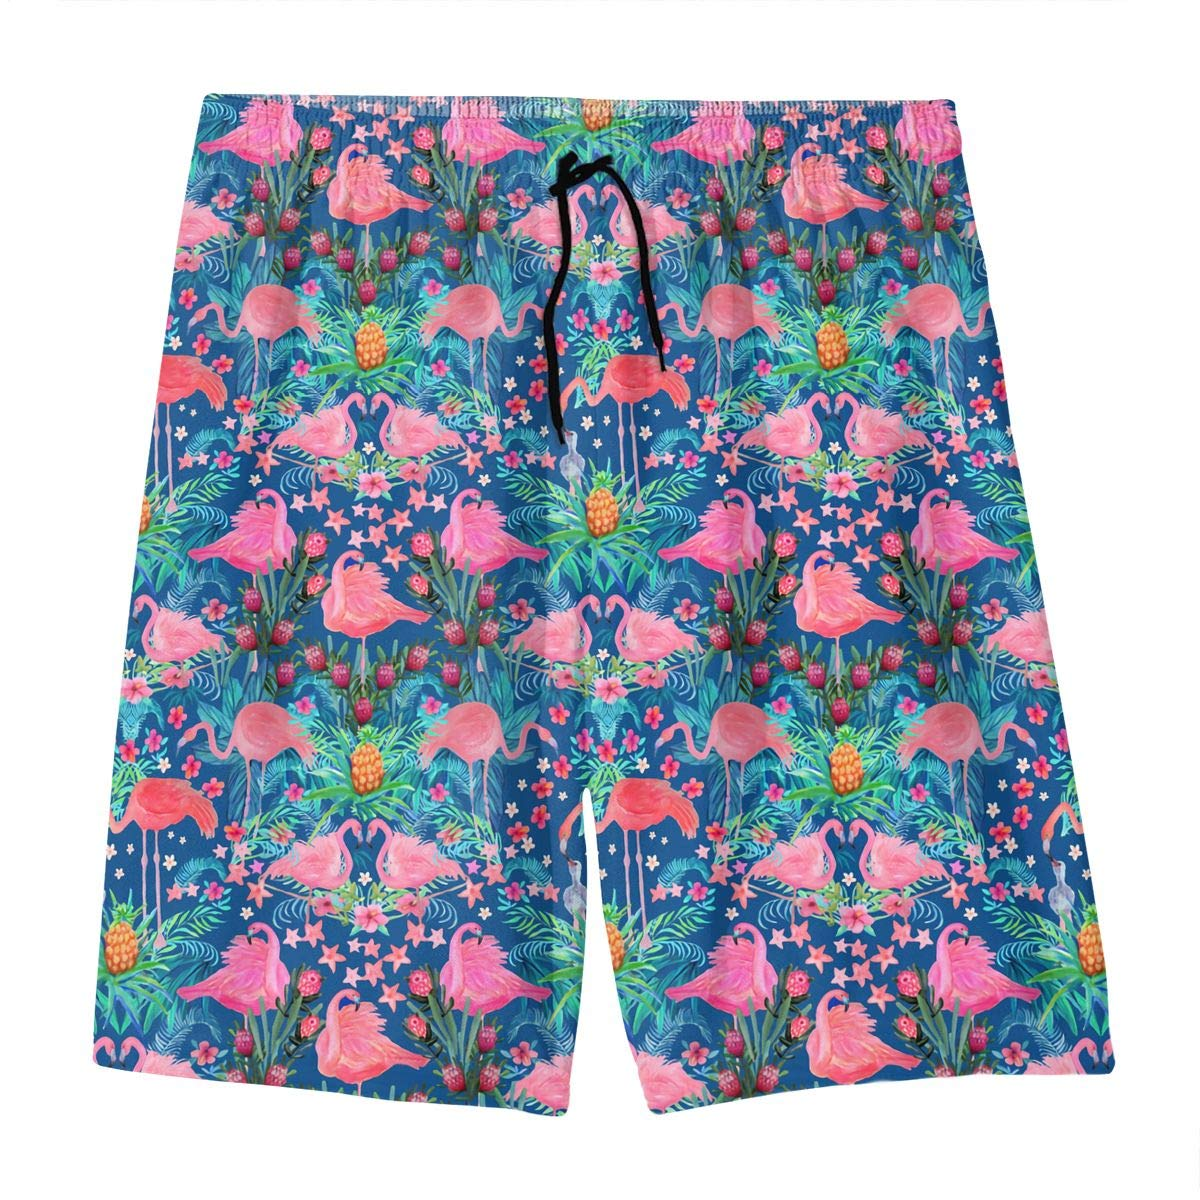 Flamingo Pineapple Woodland Navy Blue Teen Swim Trunks Bathing Suit Shorts Board Beach